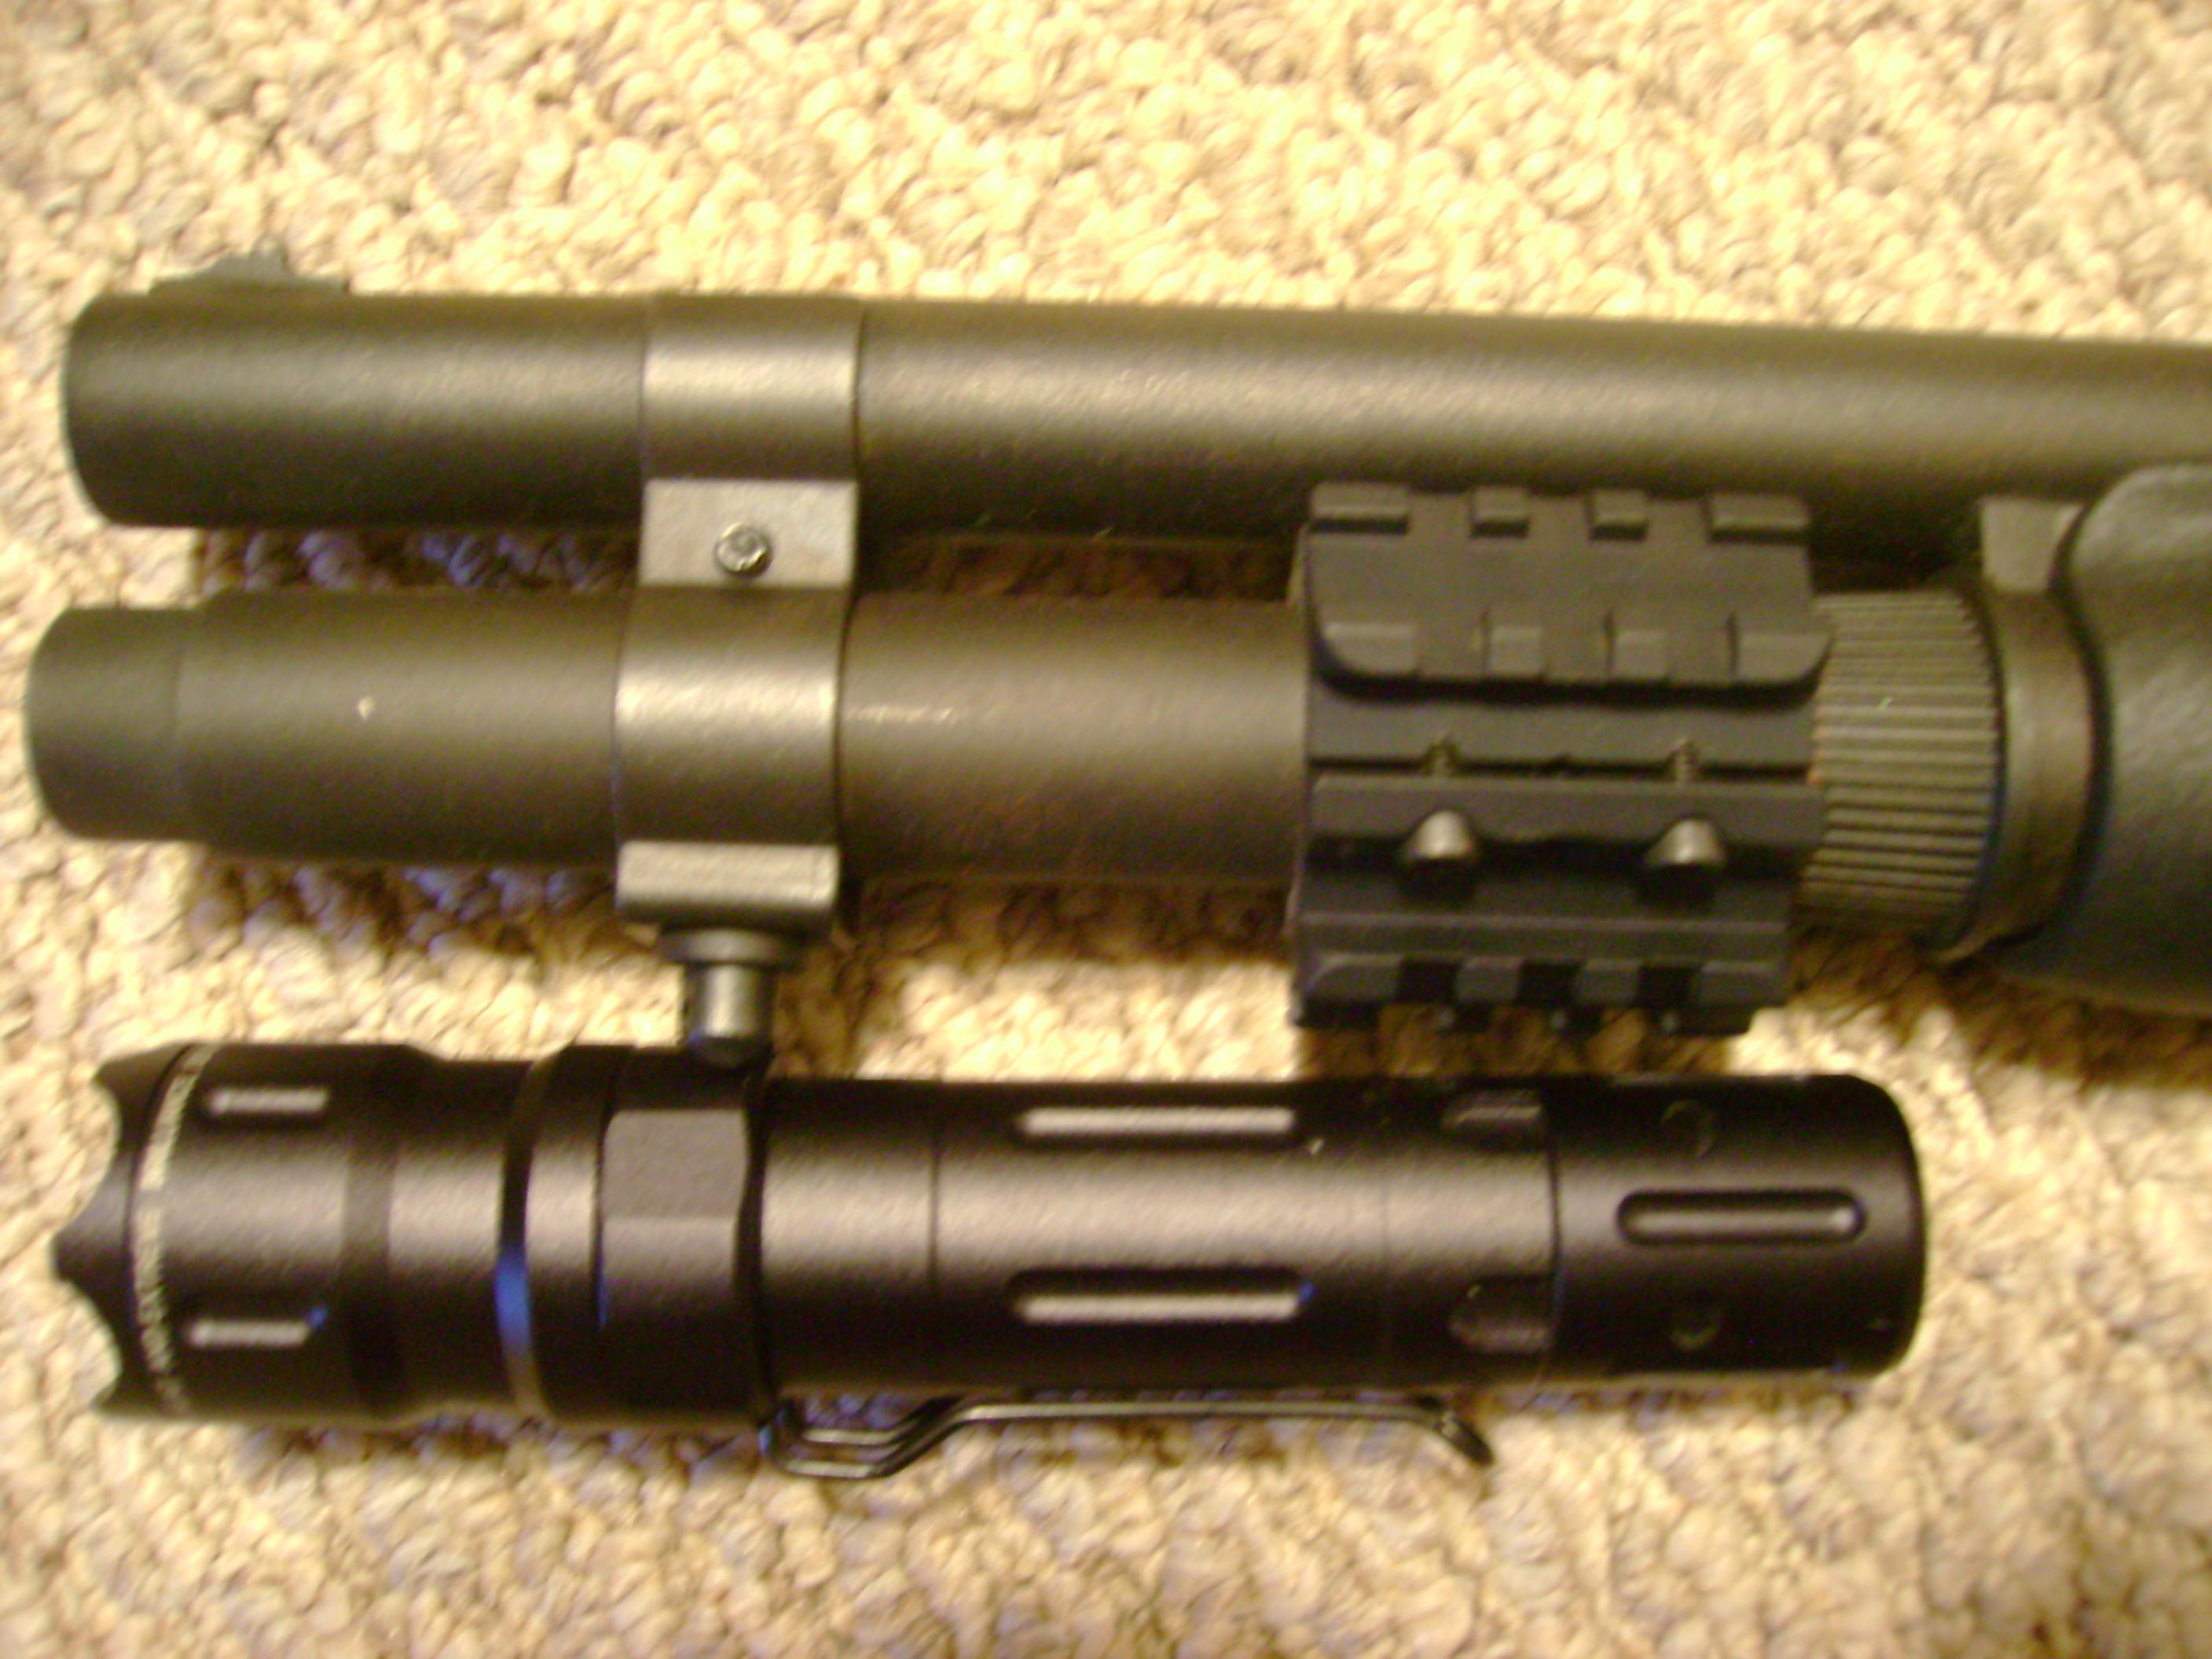 Shotgun for Home Defense-picture-005.jpg